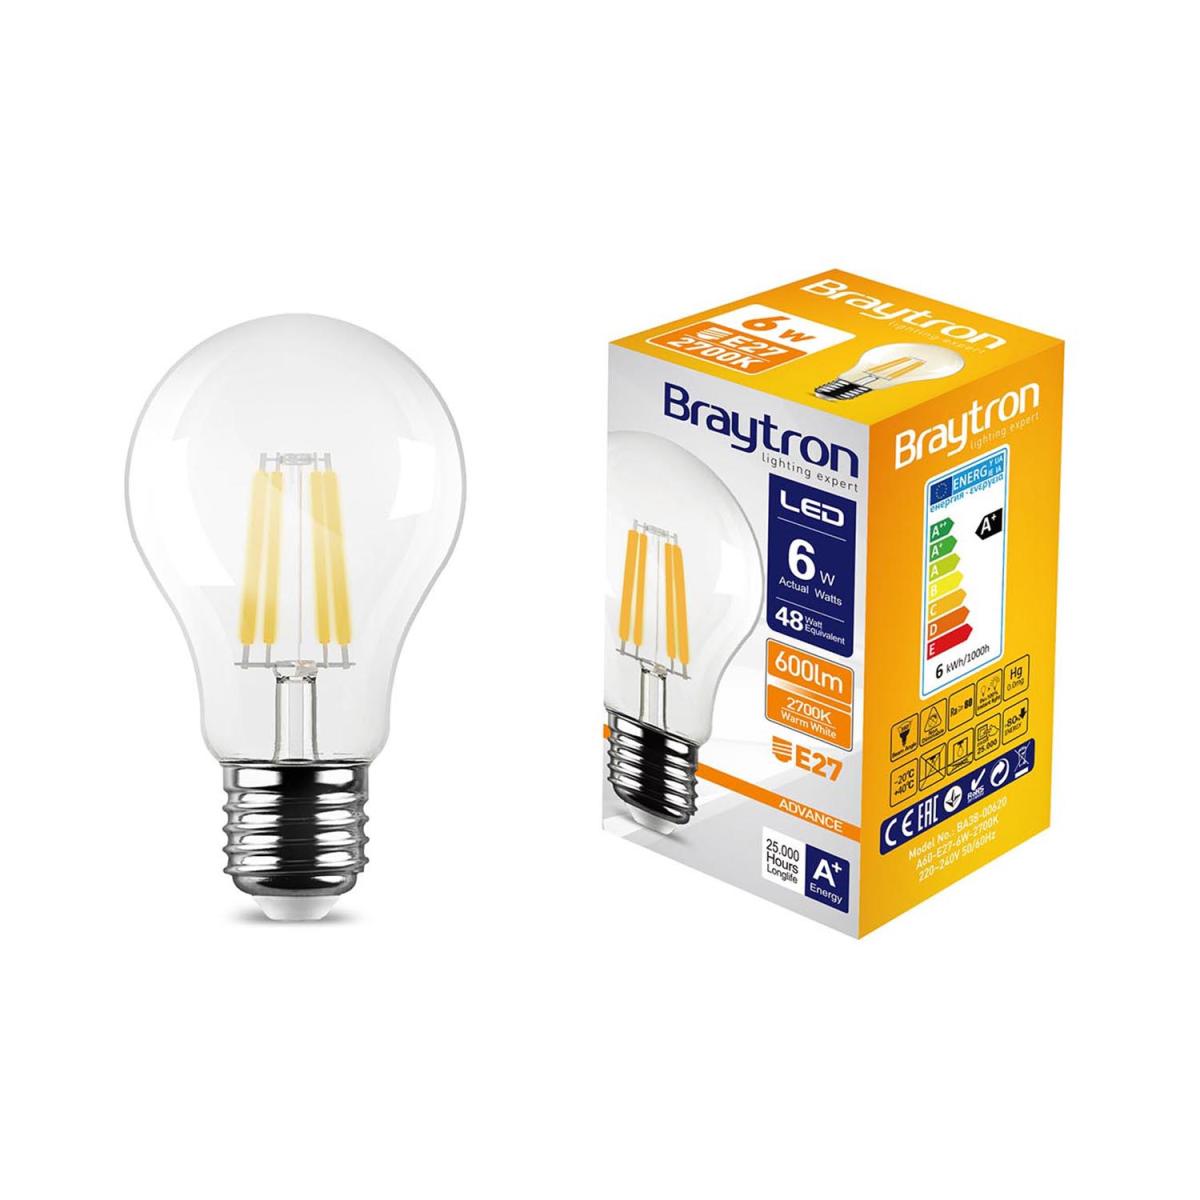 led leuchtmittel filament e27 standard a60 6w 600 lumen warmwei 3000 k 2 79. Black Bedroom Furniture Sets. Home Design Ideas